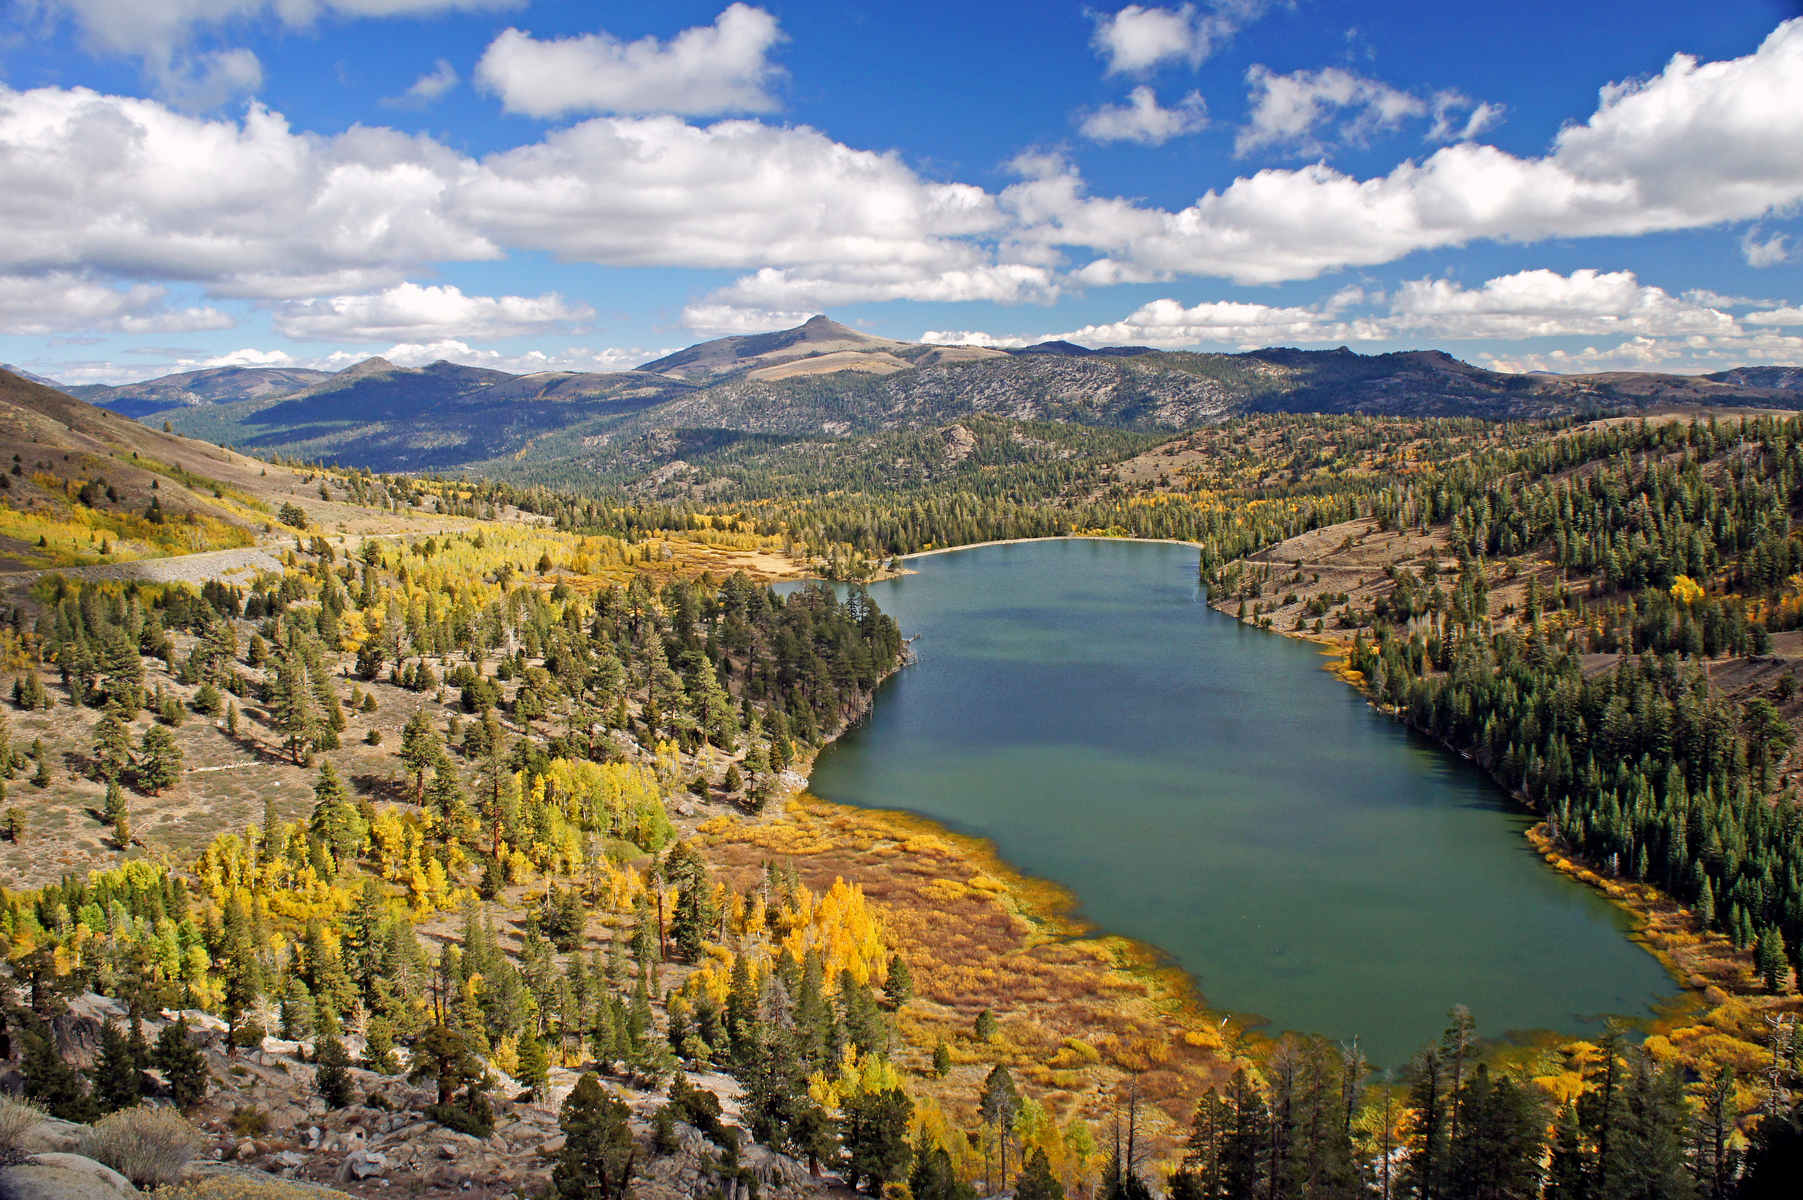 near Kirkwood, south of Lake Tahoe, California